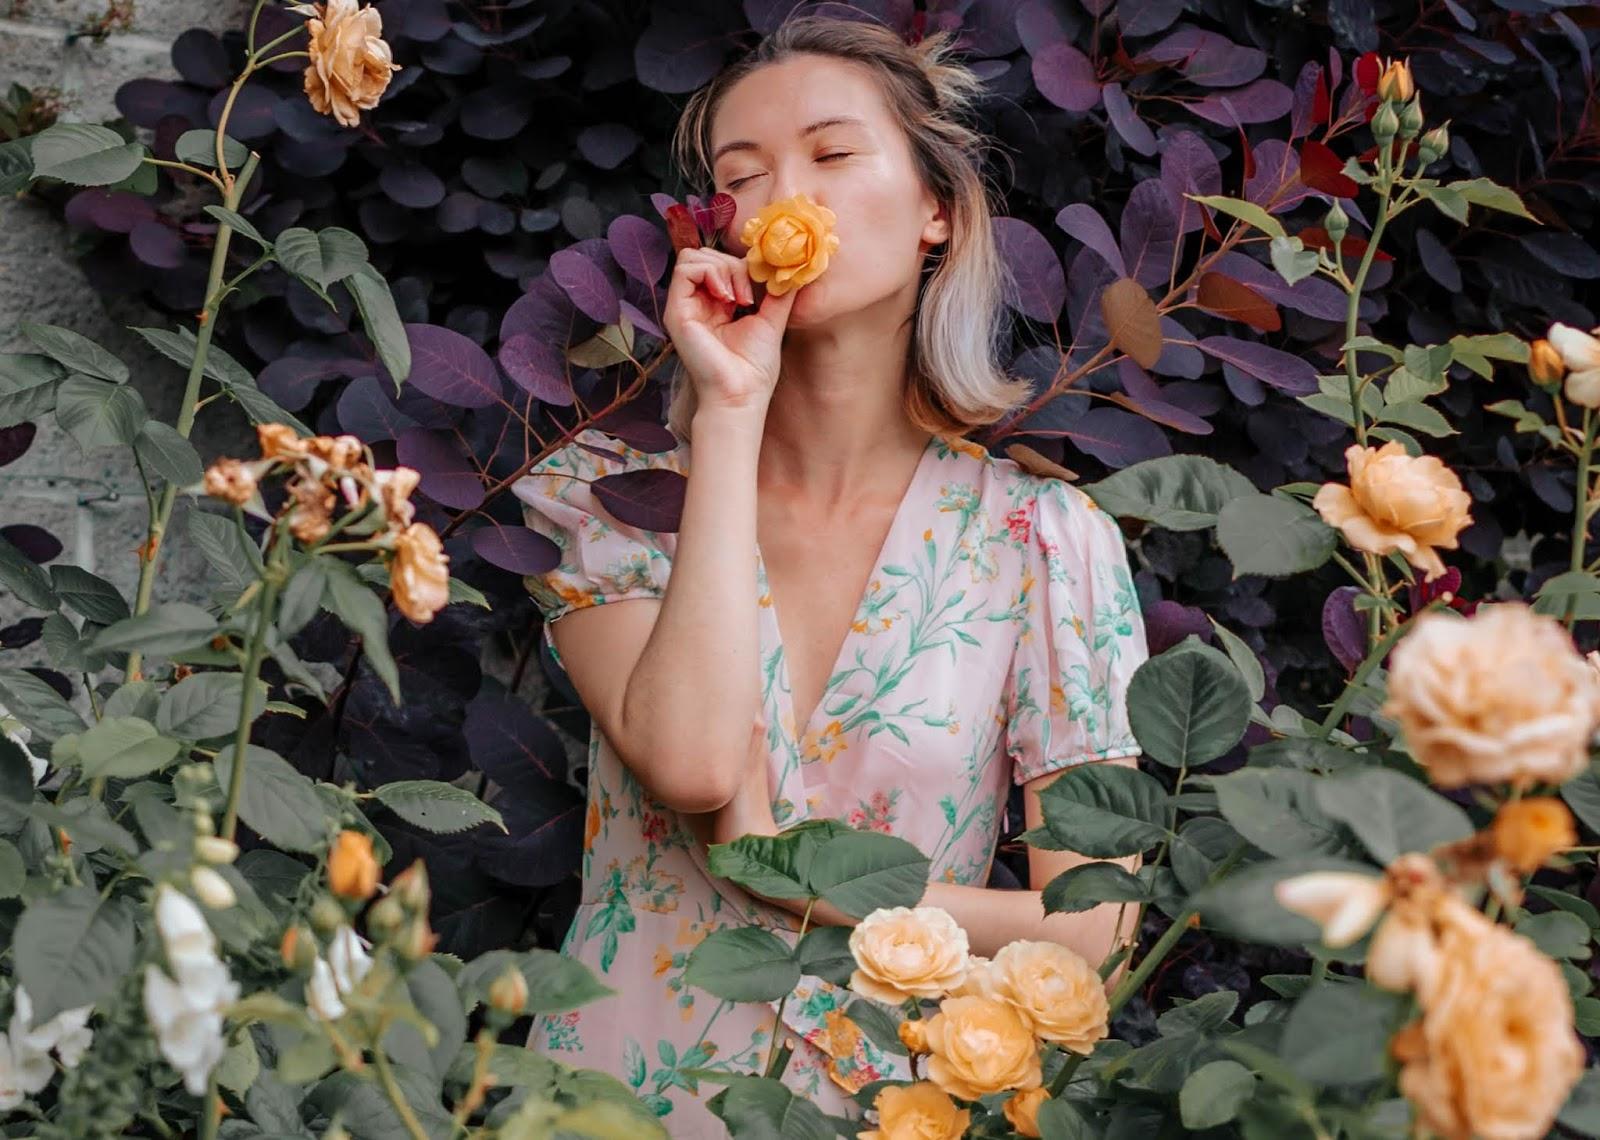 VanDusen Botanical Garden, Vancouver, boater hat, rattan purse, wicker purse, style blogger, travel style, travel blogger, things to do in vancouver, summer lookbook, fall lookbook, fall trends, canadian blogger, canadian fashion, nordstrom, zara fall 2018, roju store, urban outfitters, rose garden